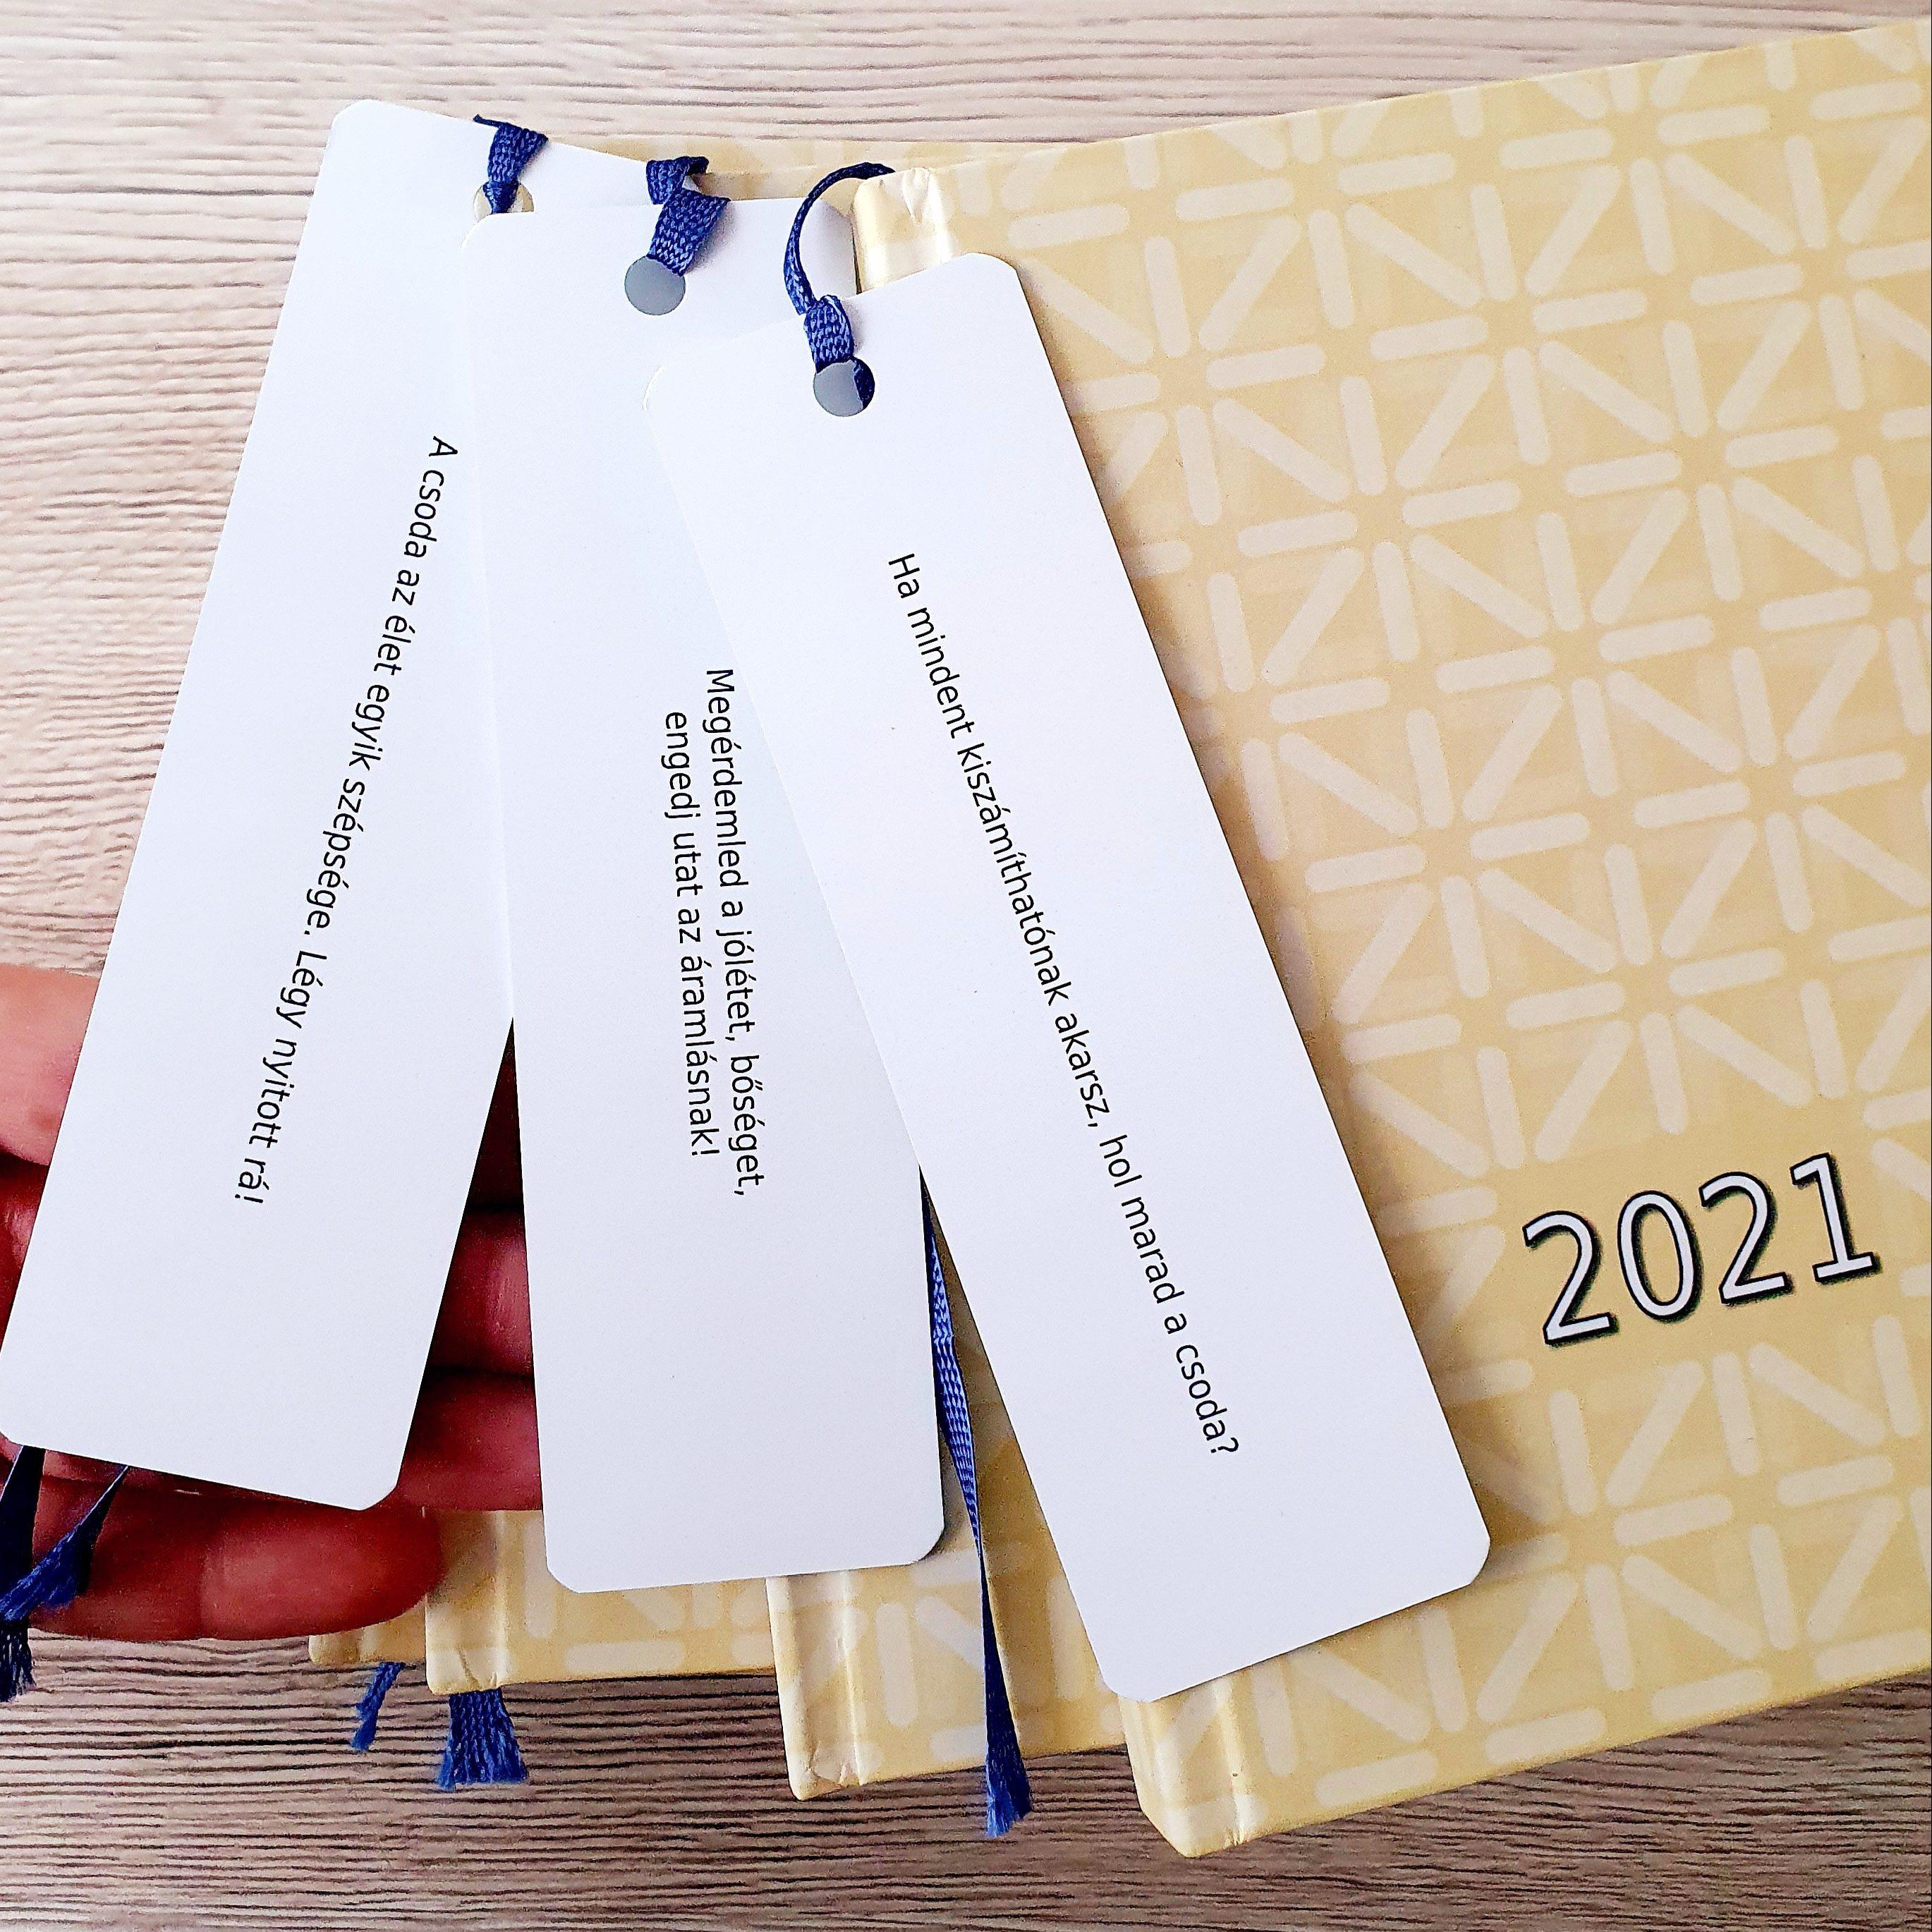 2021 ZIN naptár